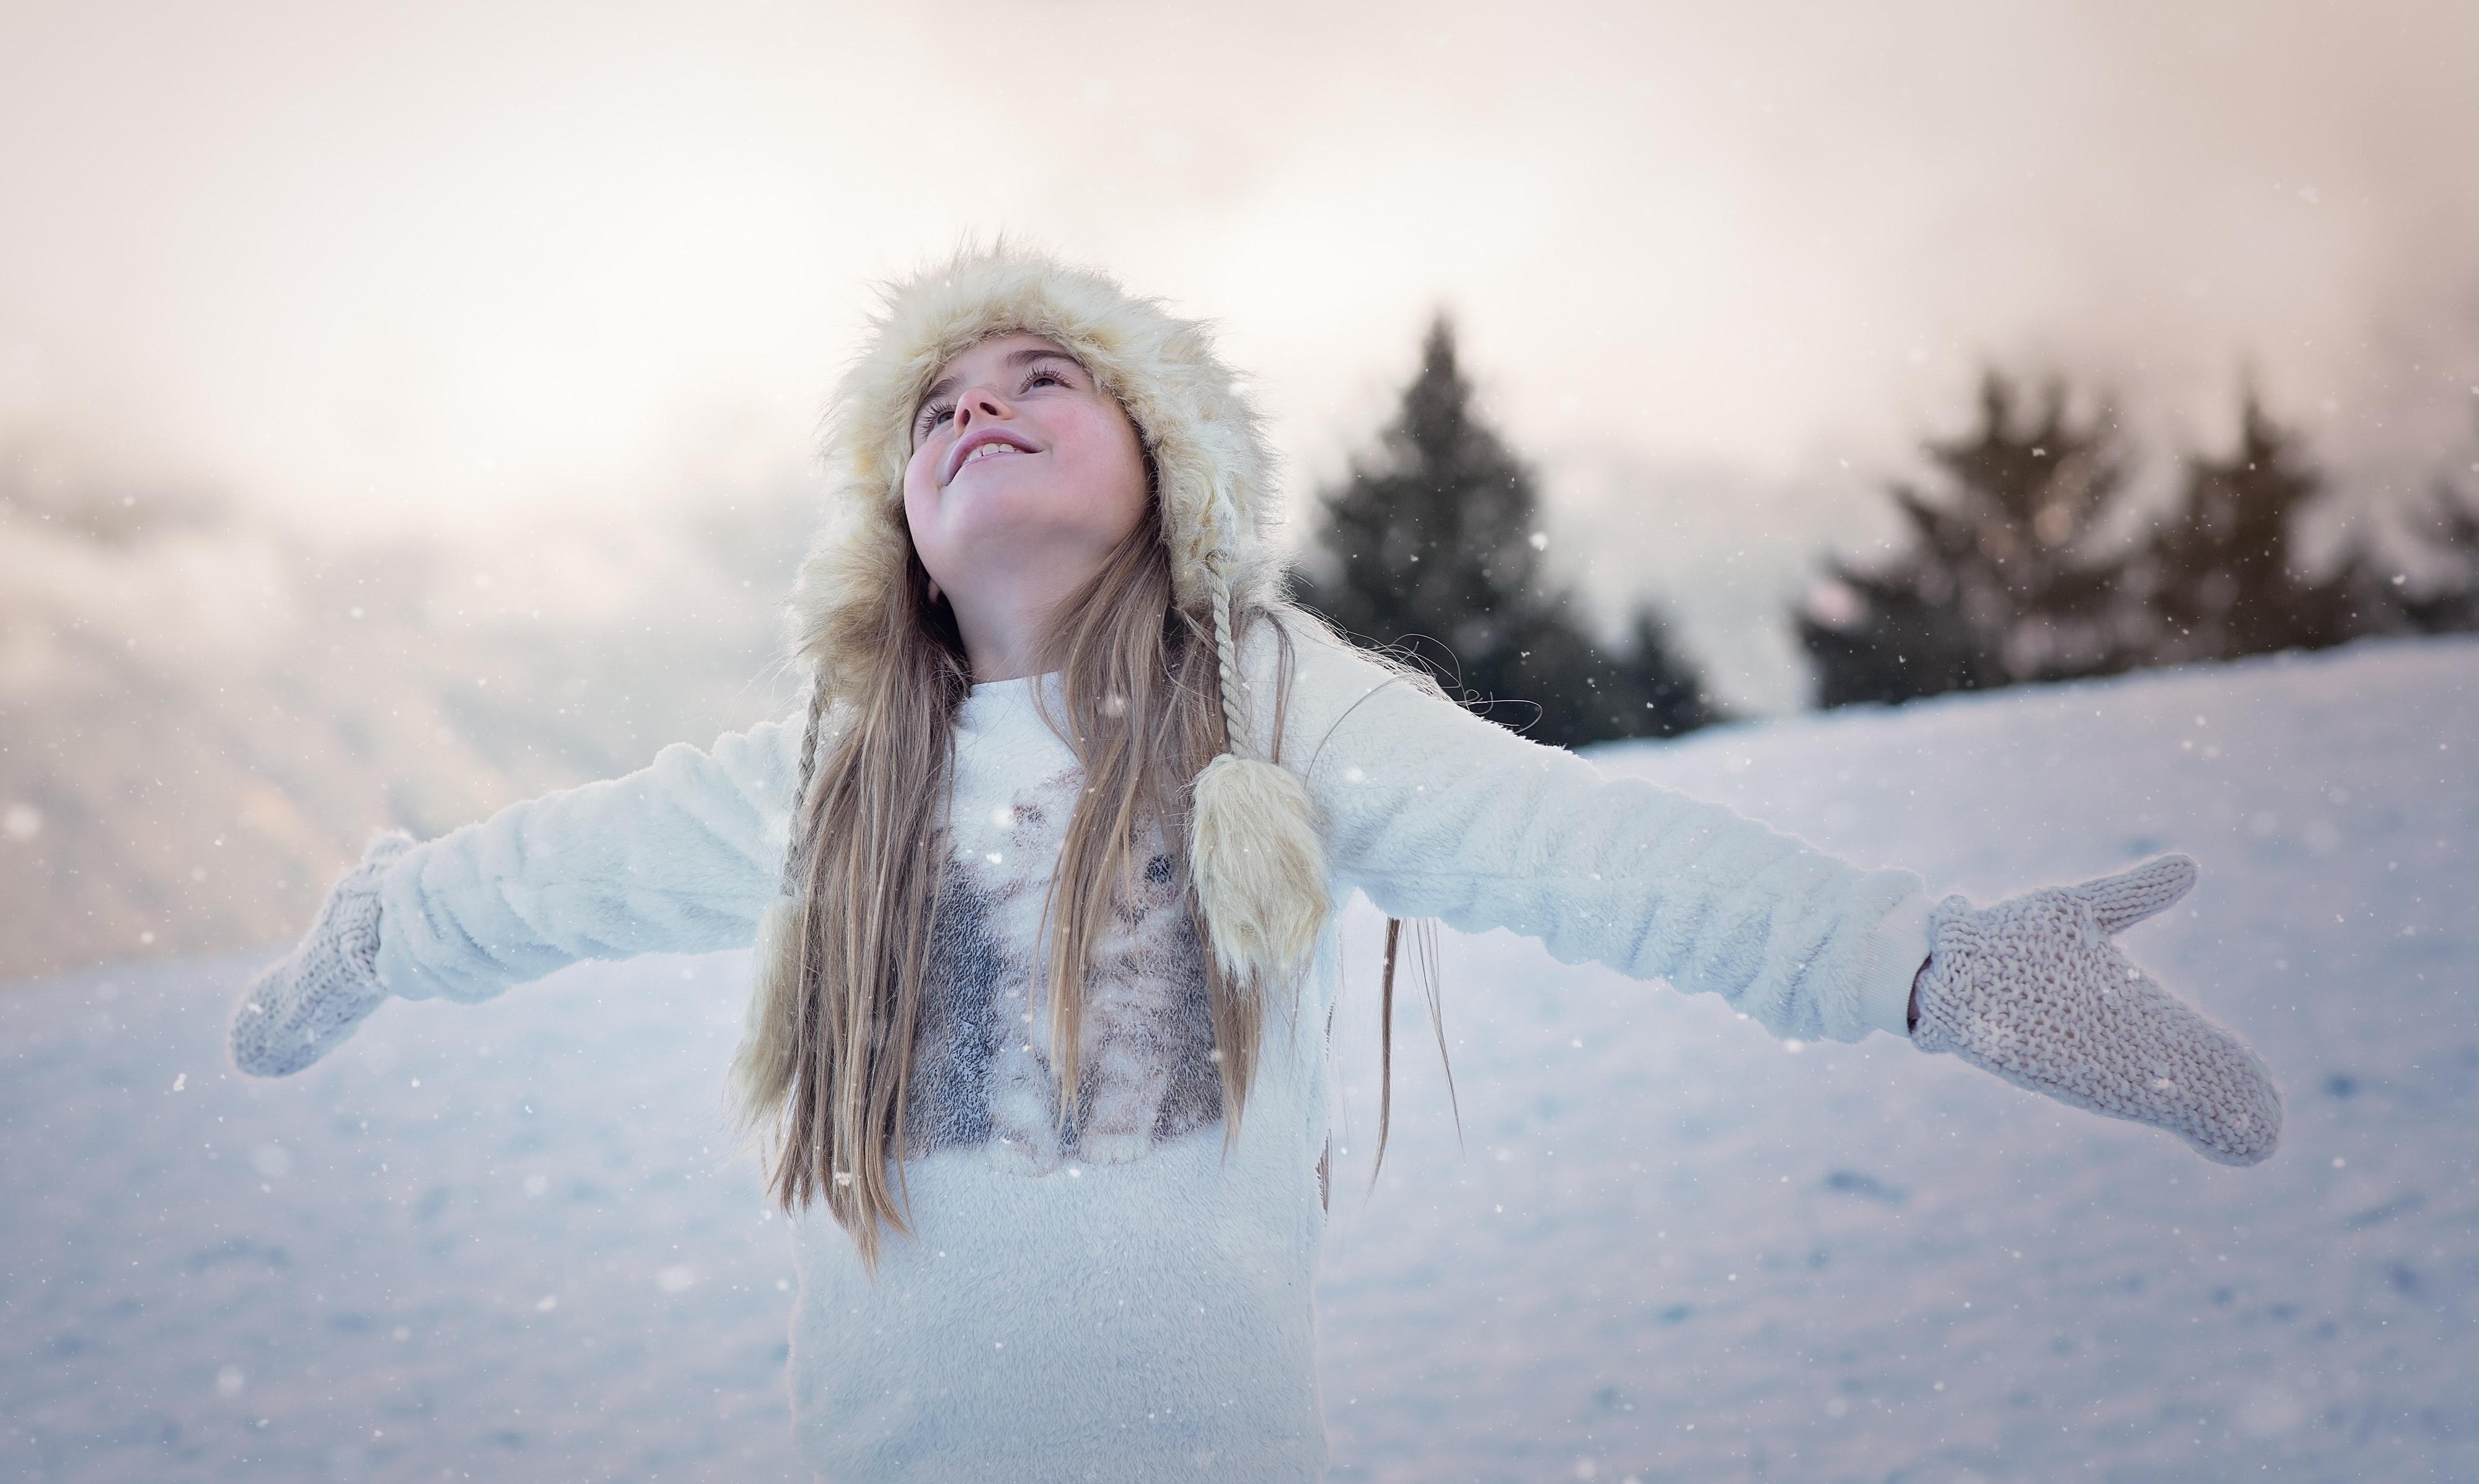 b3ebcda415 Young Woman in Snow · Free Stock Photo